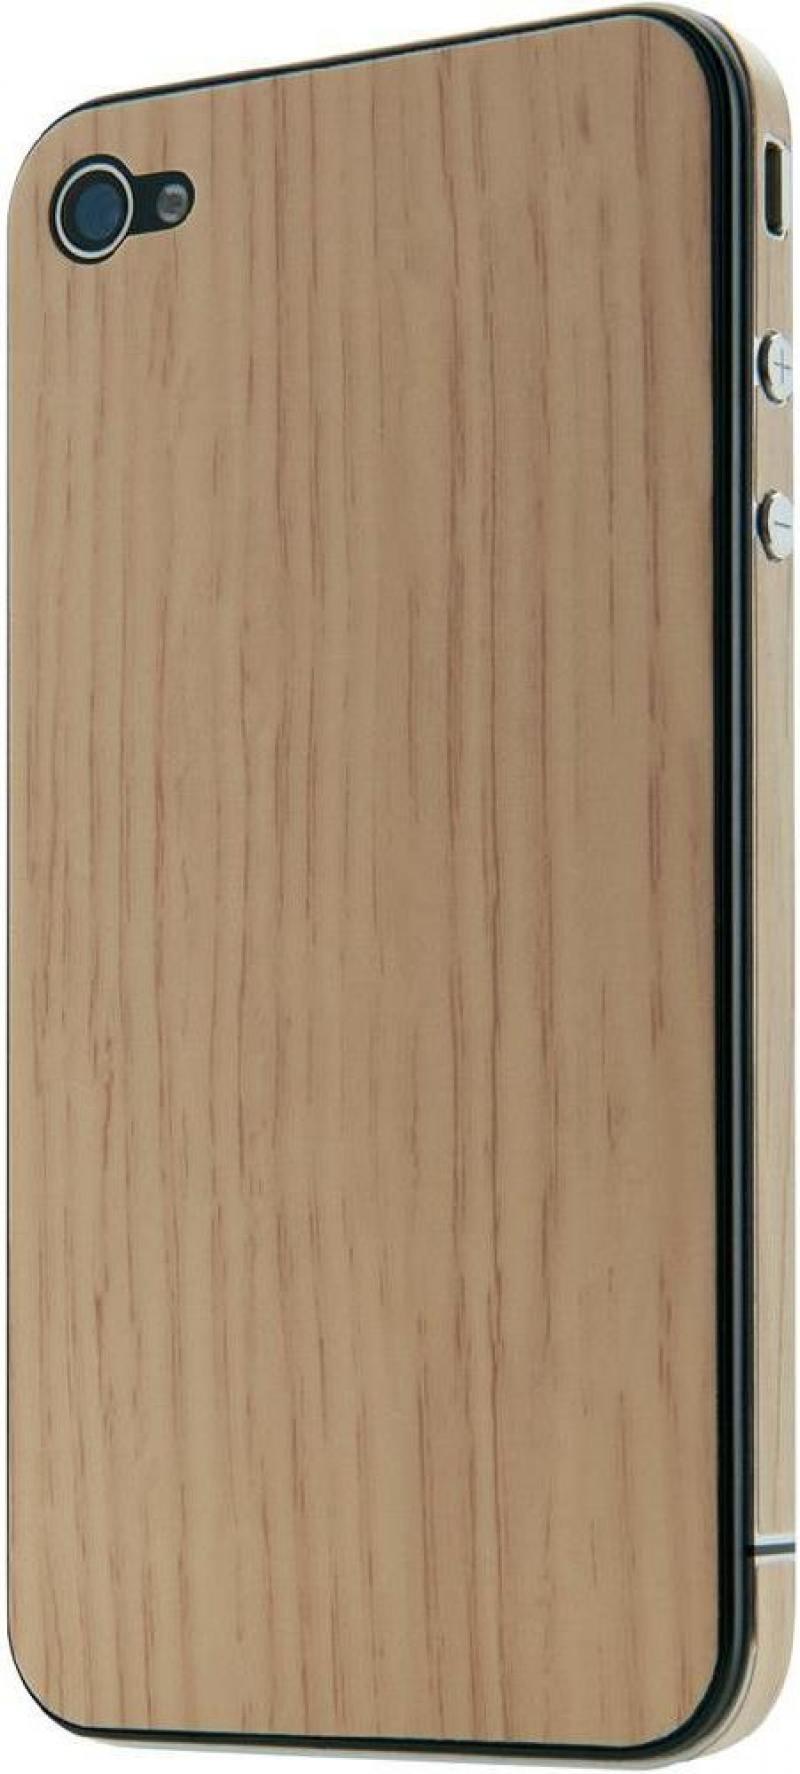 Защитная плёнка Belkin F8Z893CWC01 для iPhone 4 iPhone 4S аксессуар vinca sport am 04 для iphone 4 4s 5